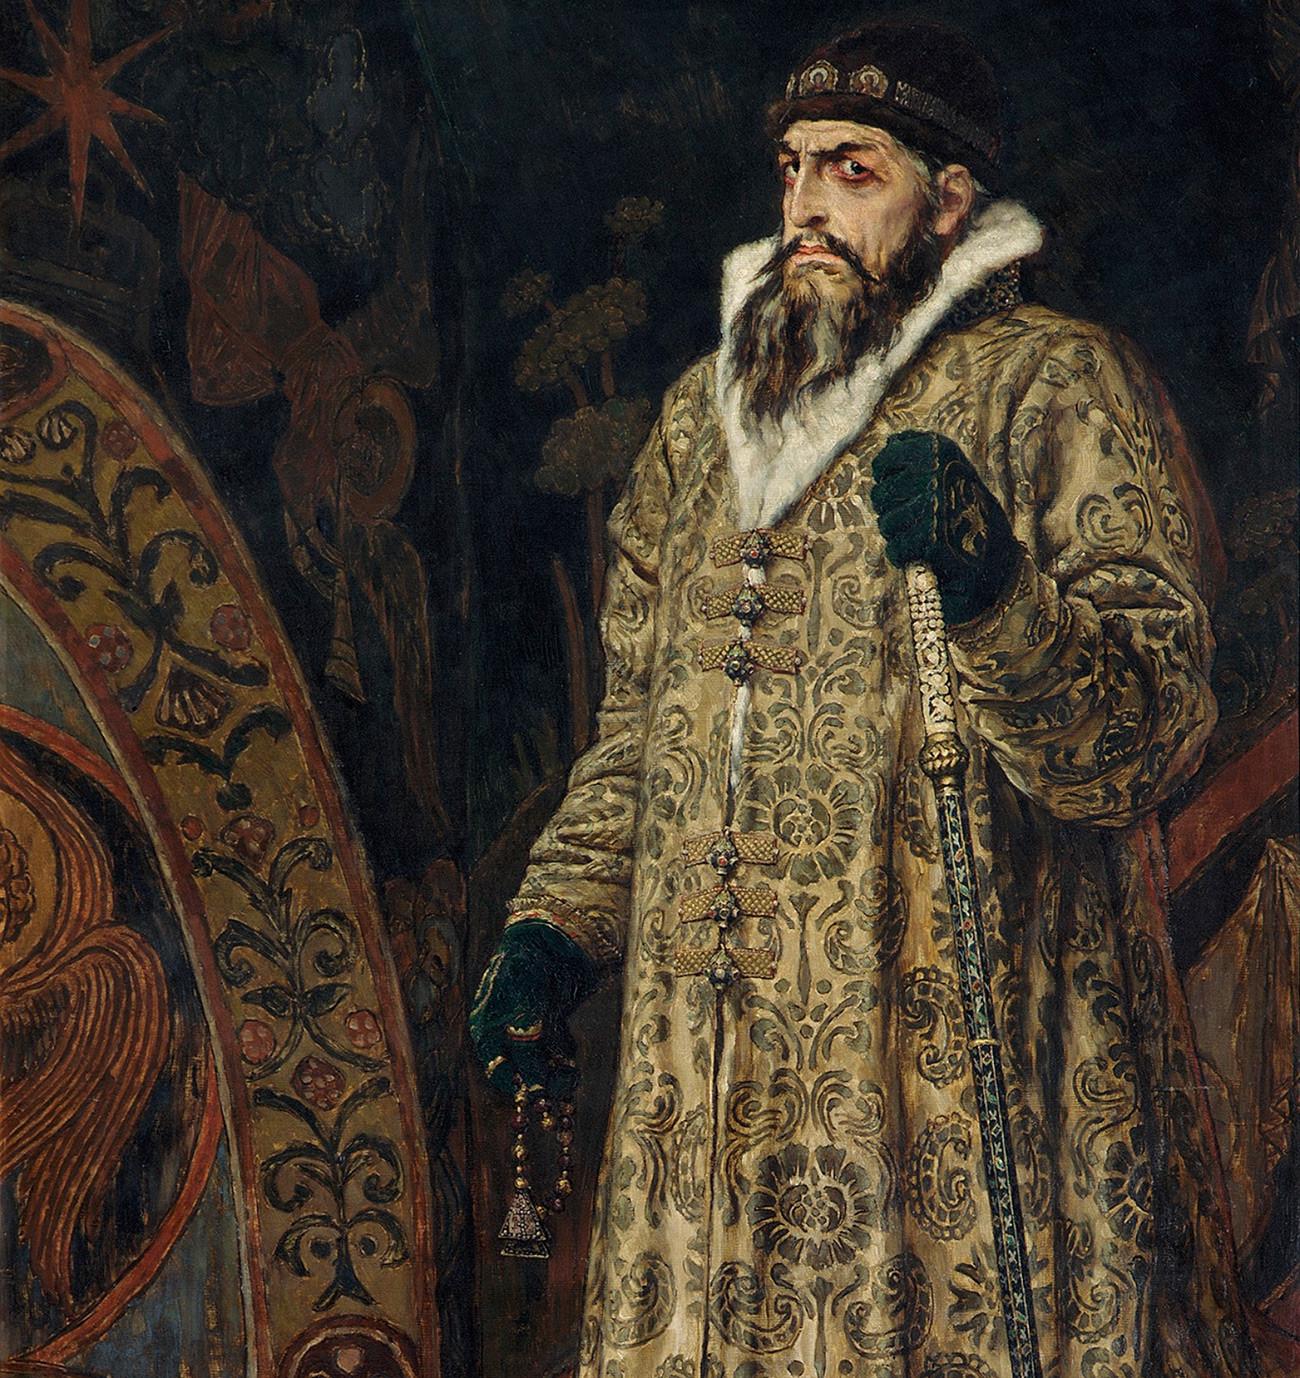 Ivan IV. Grozni